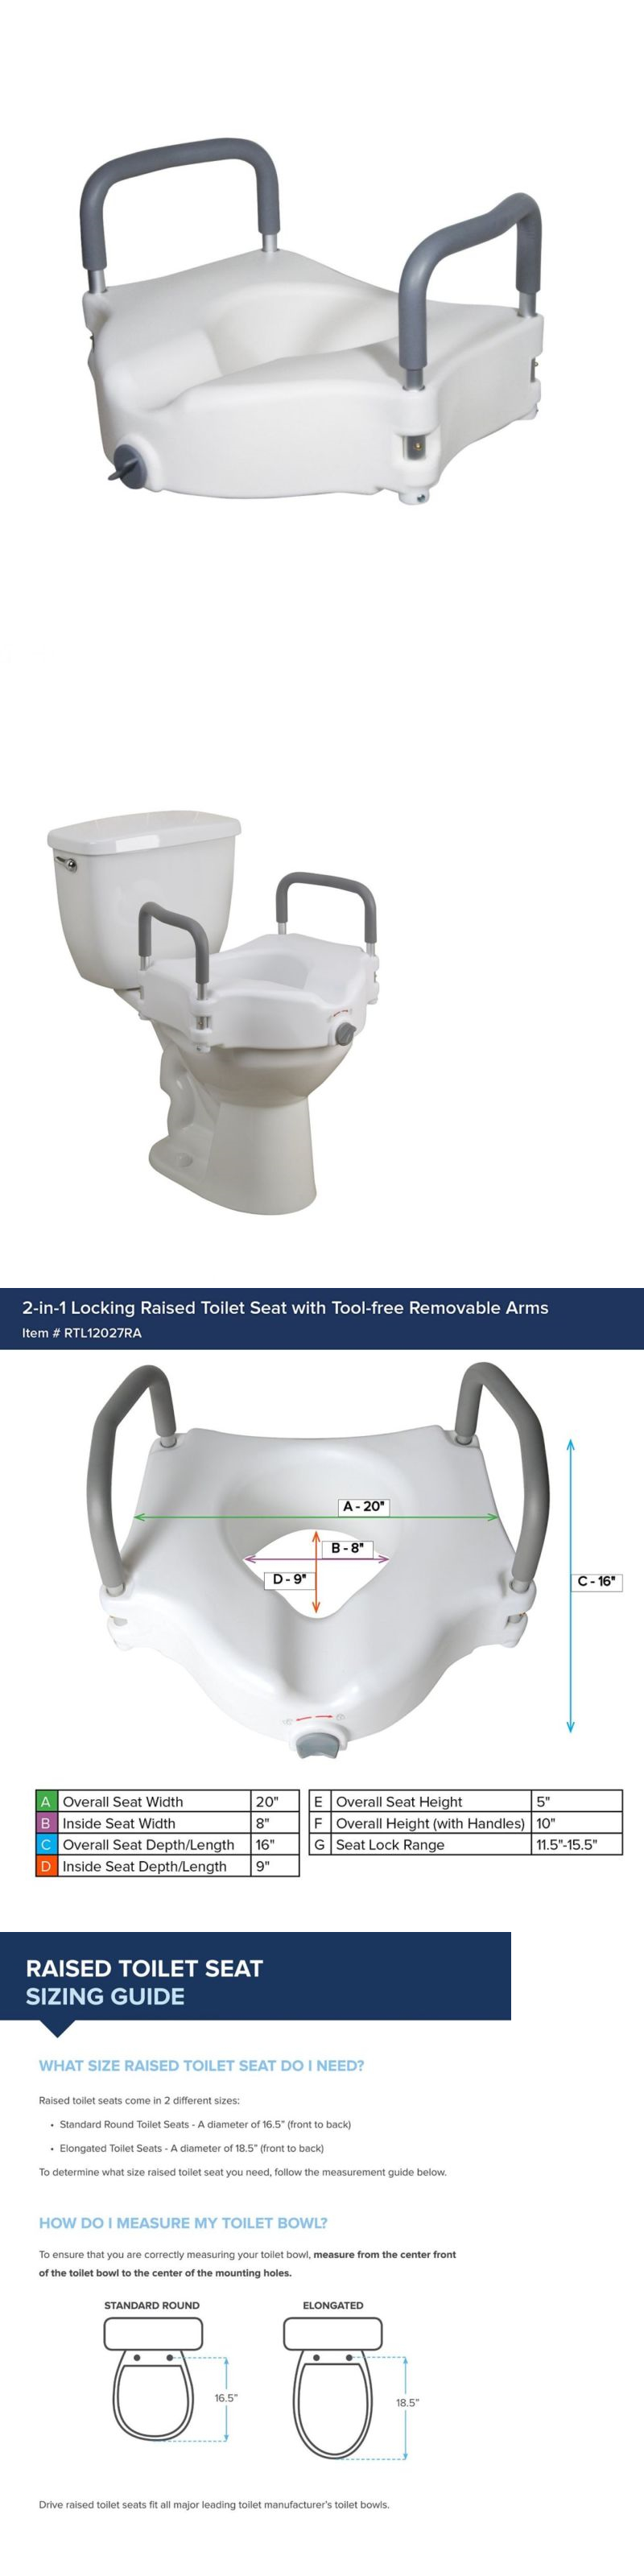 Toilet seat riser drive medical - Toilet Seats Drive Medical Elevated Raised Toilet Seat W Padded Toilet Seat Elongated